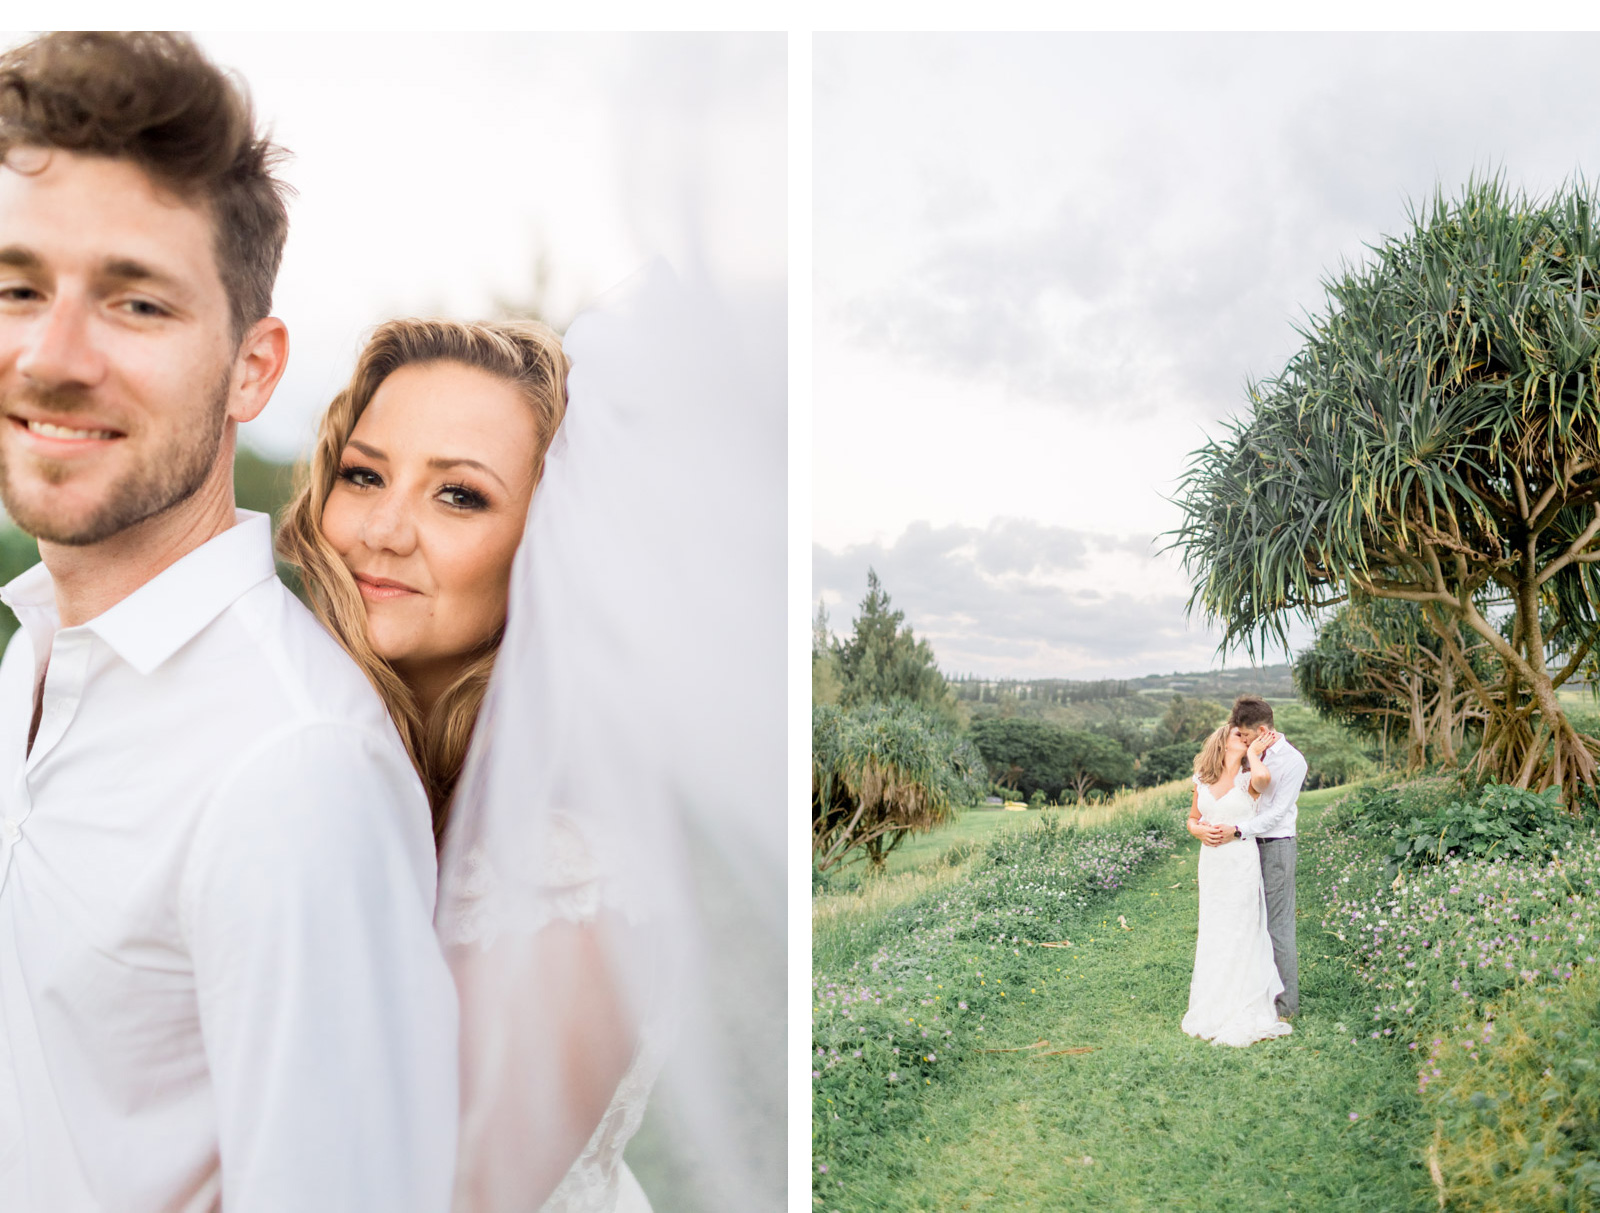 Natalie-Schutt-Photography---Southern-California-Wedding-Photographer_08.jpg